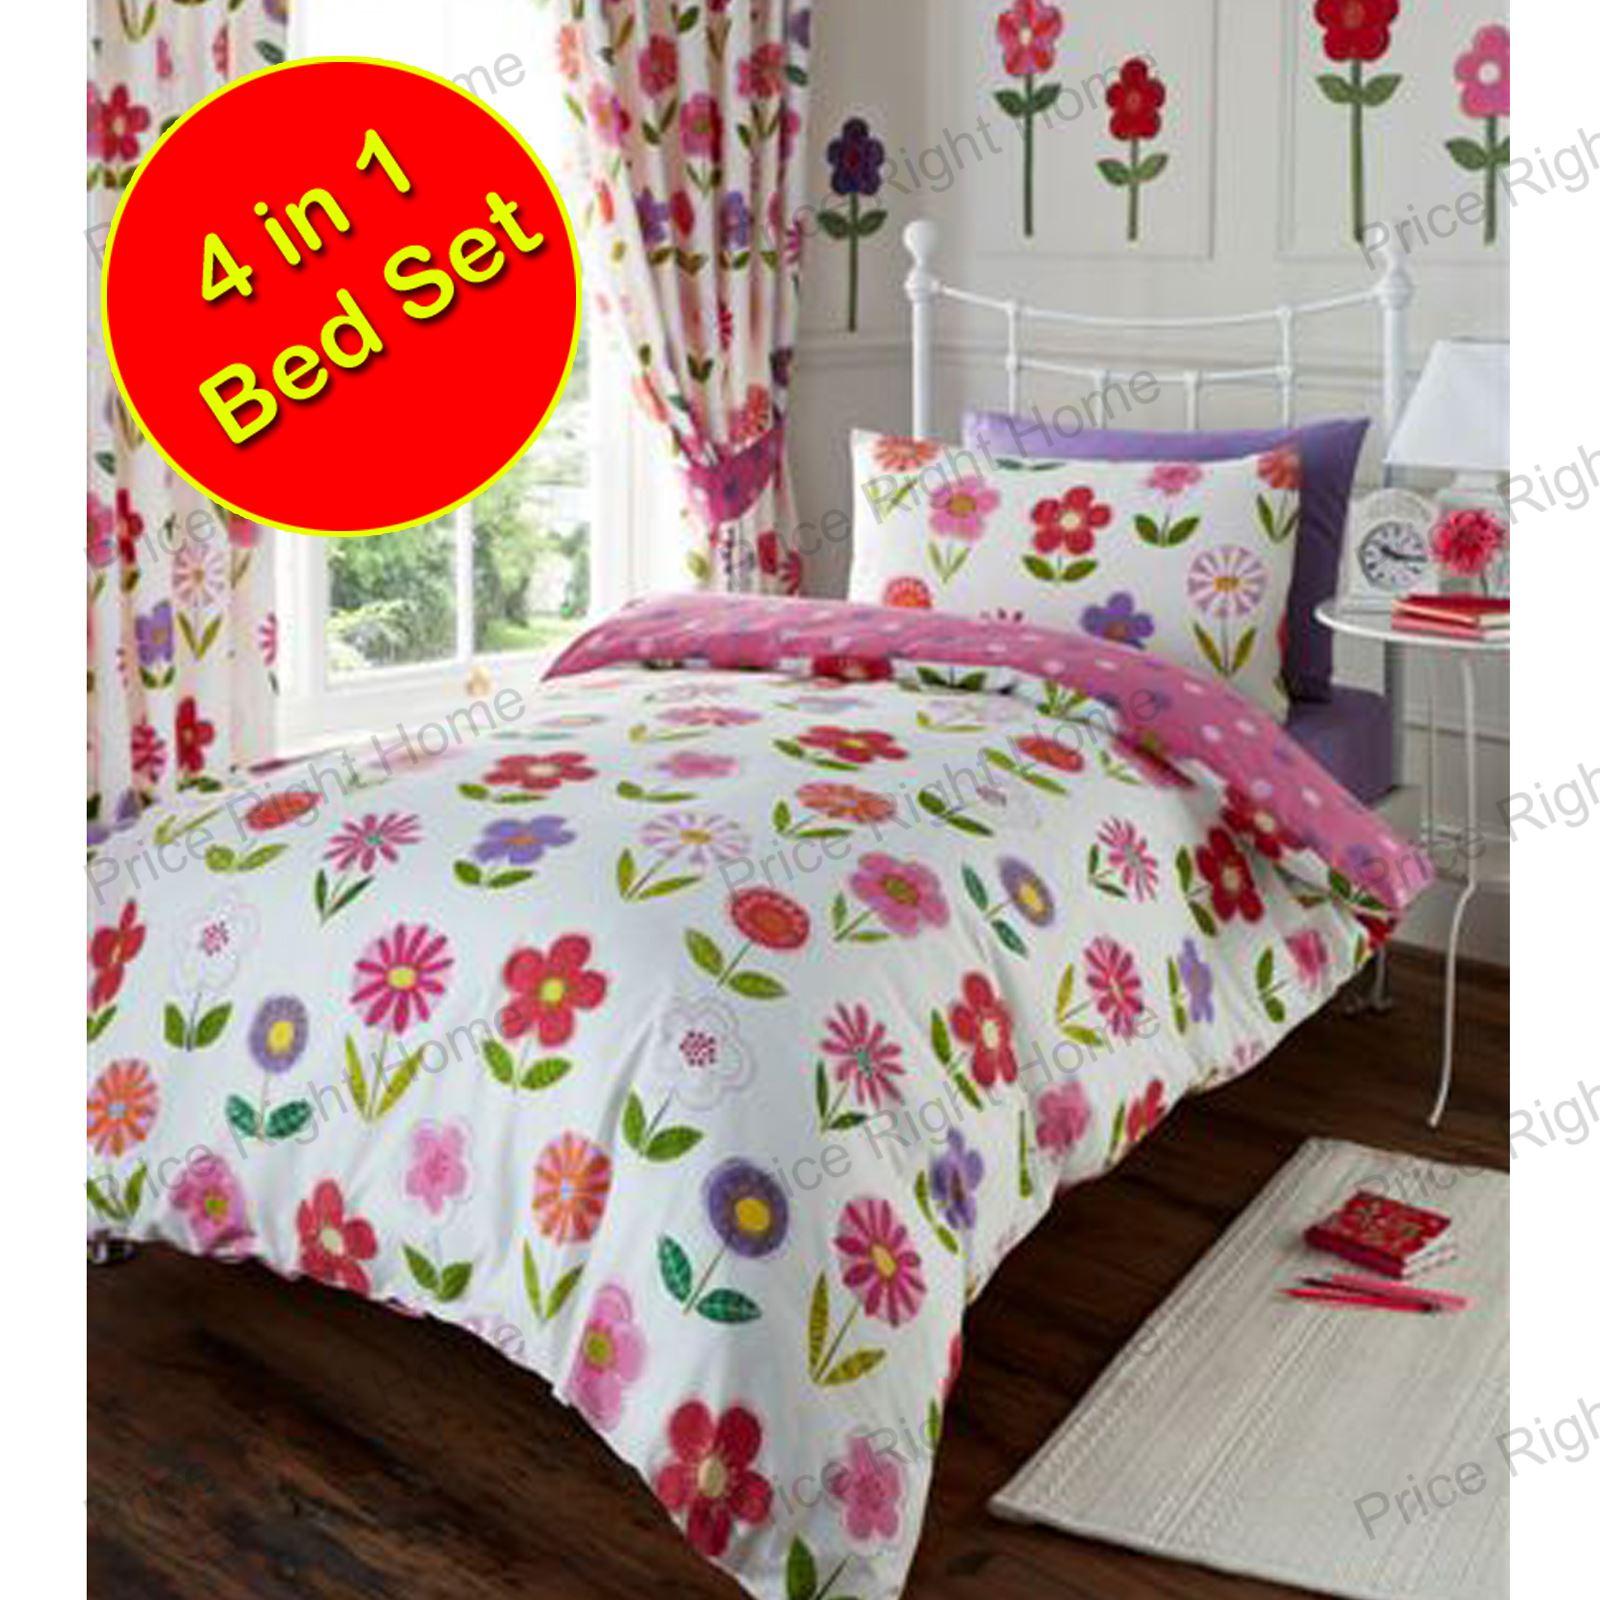 Junior Toddler Bedding Set Duvet Covers Quilt Pillow